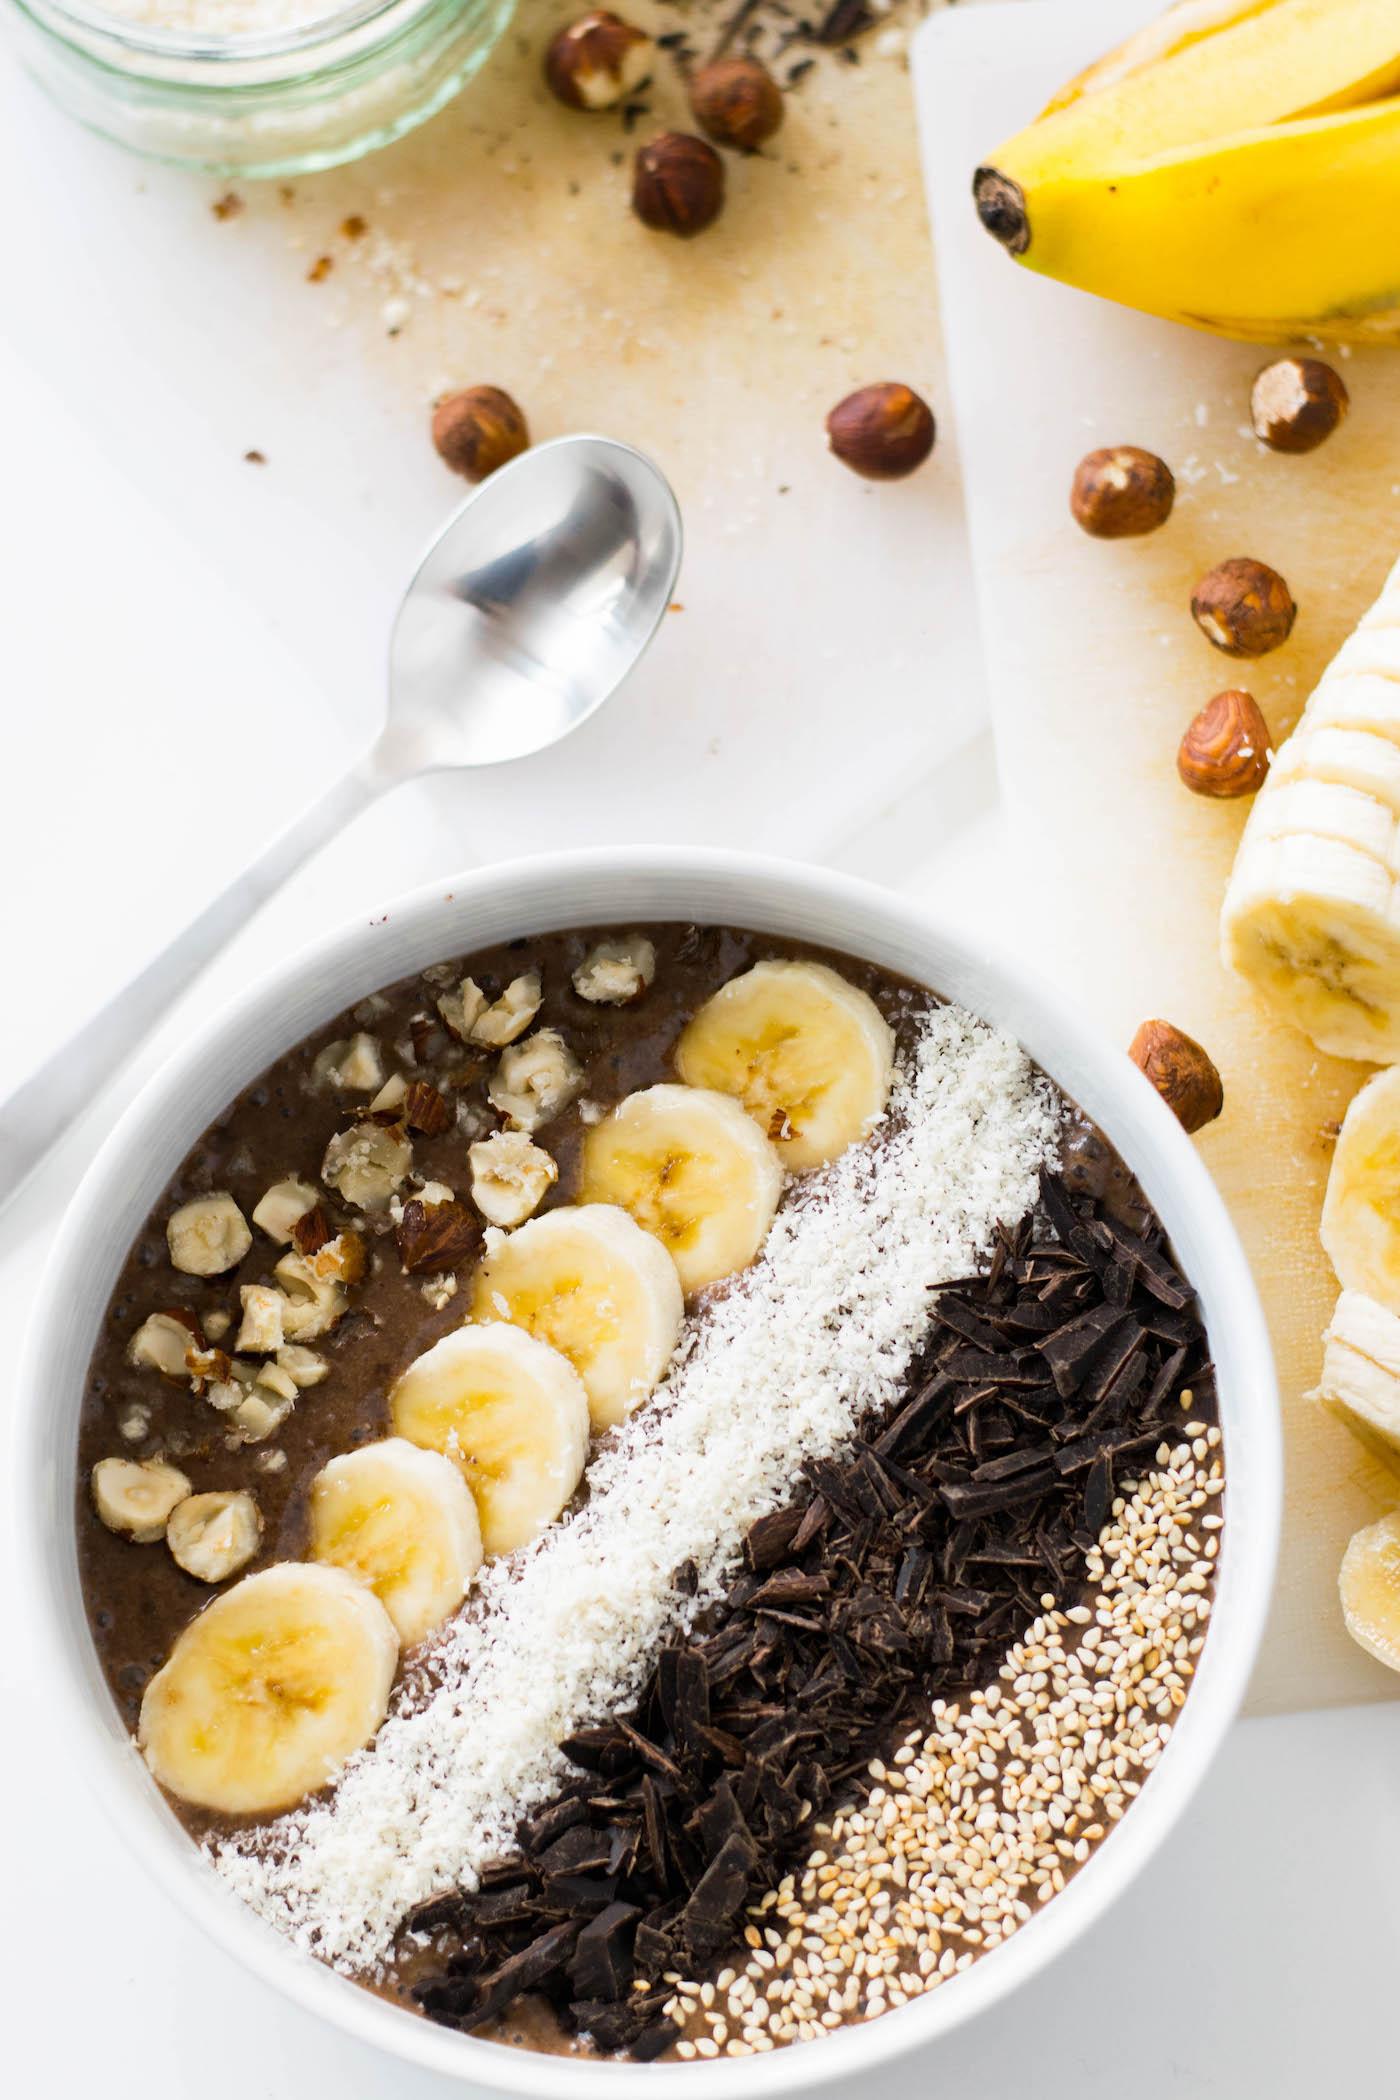 smoothie-bowl-chocolat-noisette-3.jpg